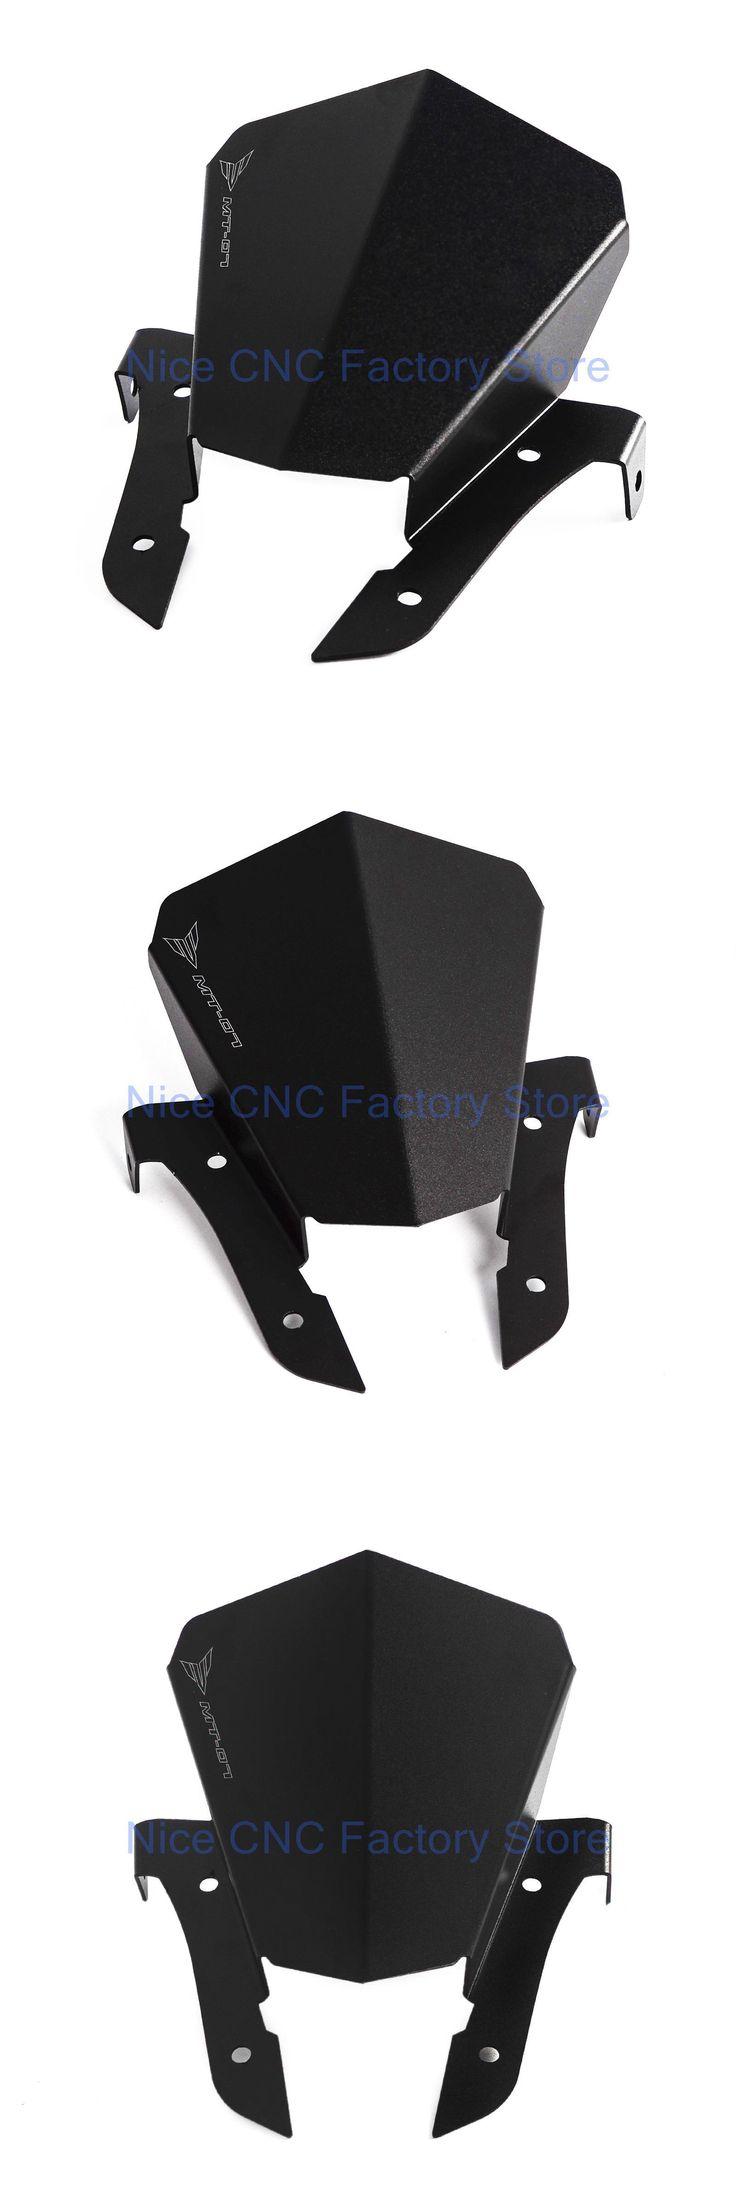 [Visit to Buy] Upper Headlight Top Mount Cover Panel Fairing Fit Yamaha MT-07 FZ-07 2014 2015 2016 MT07 FZ07 14 15 16 NEW #Advertisement